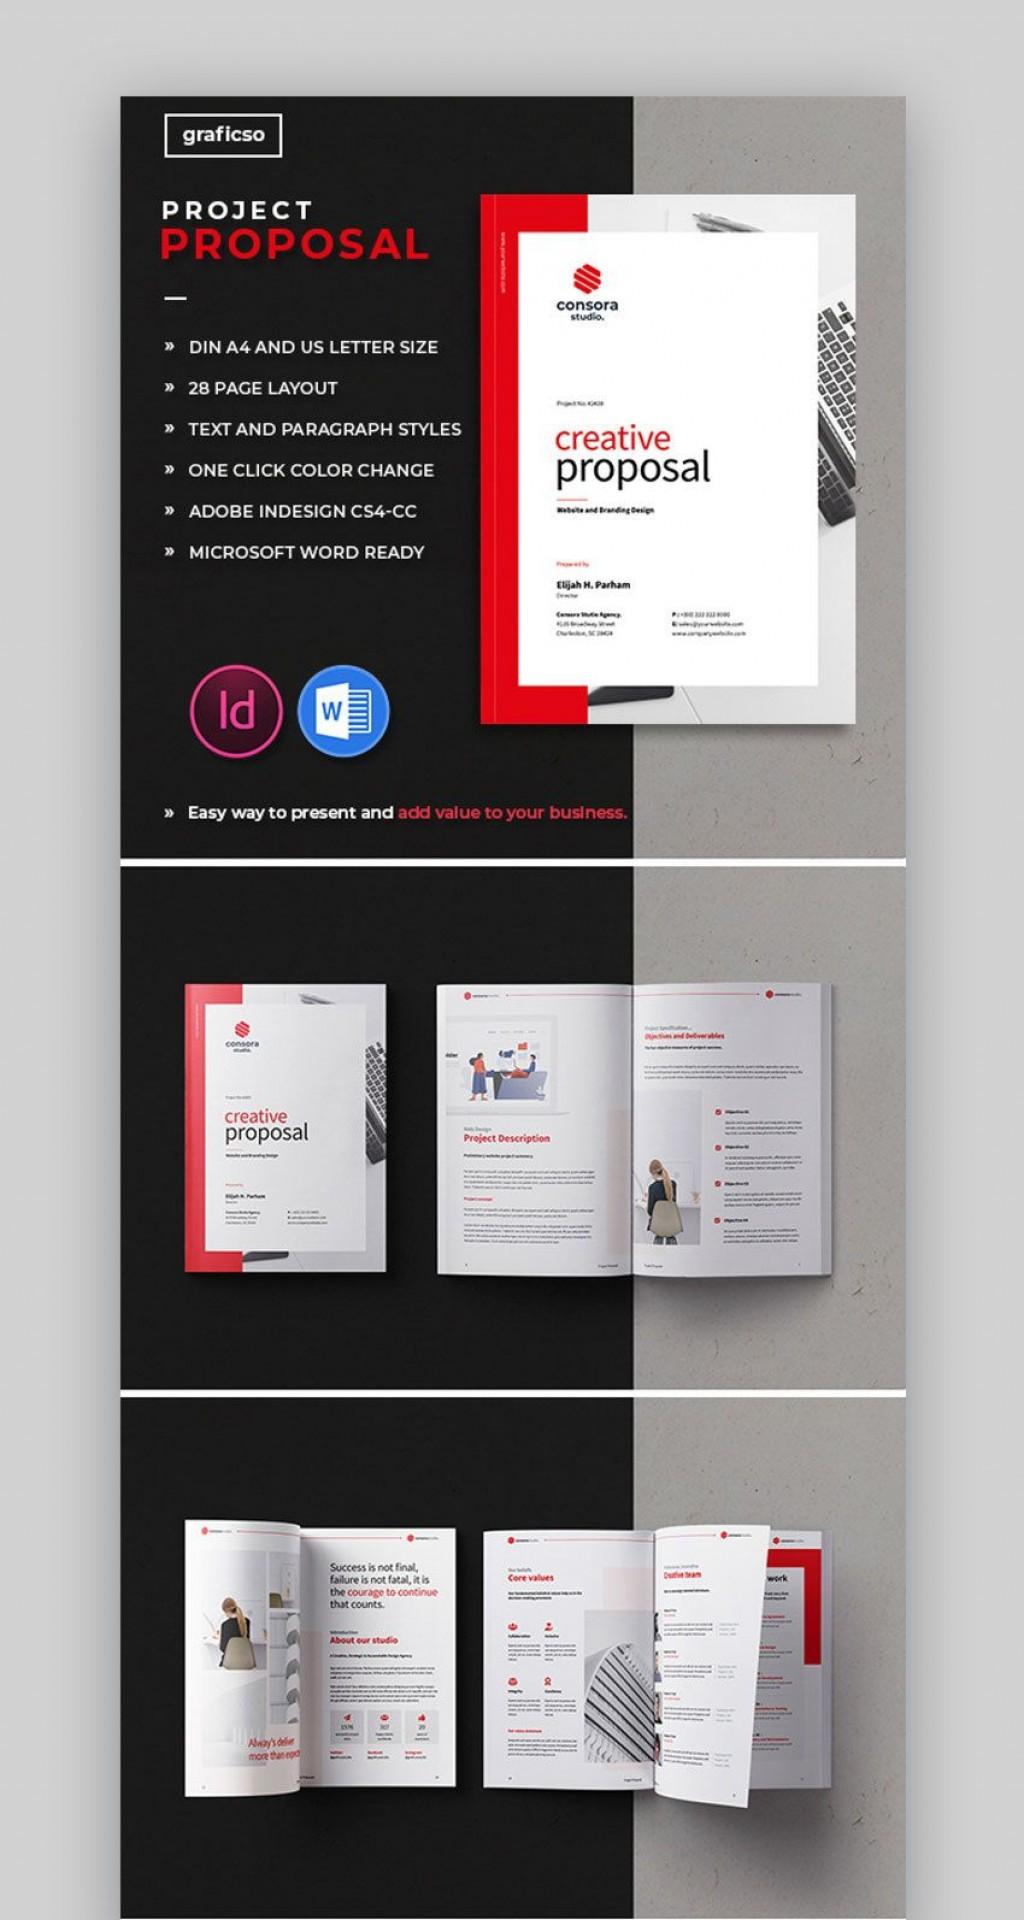 008 Shocking Graphic Design Proposal Template Free High Definition  Freelance Pdf IndesignLarge